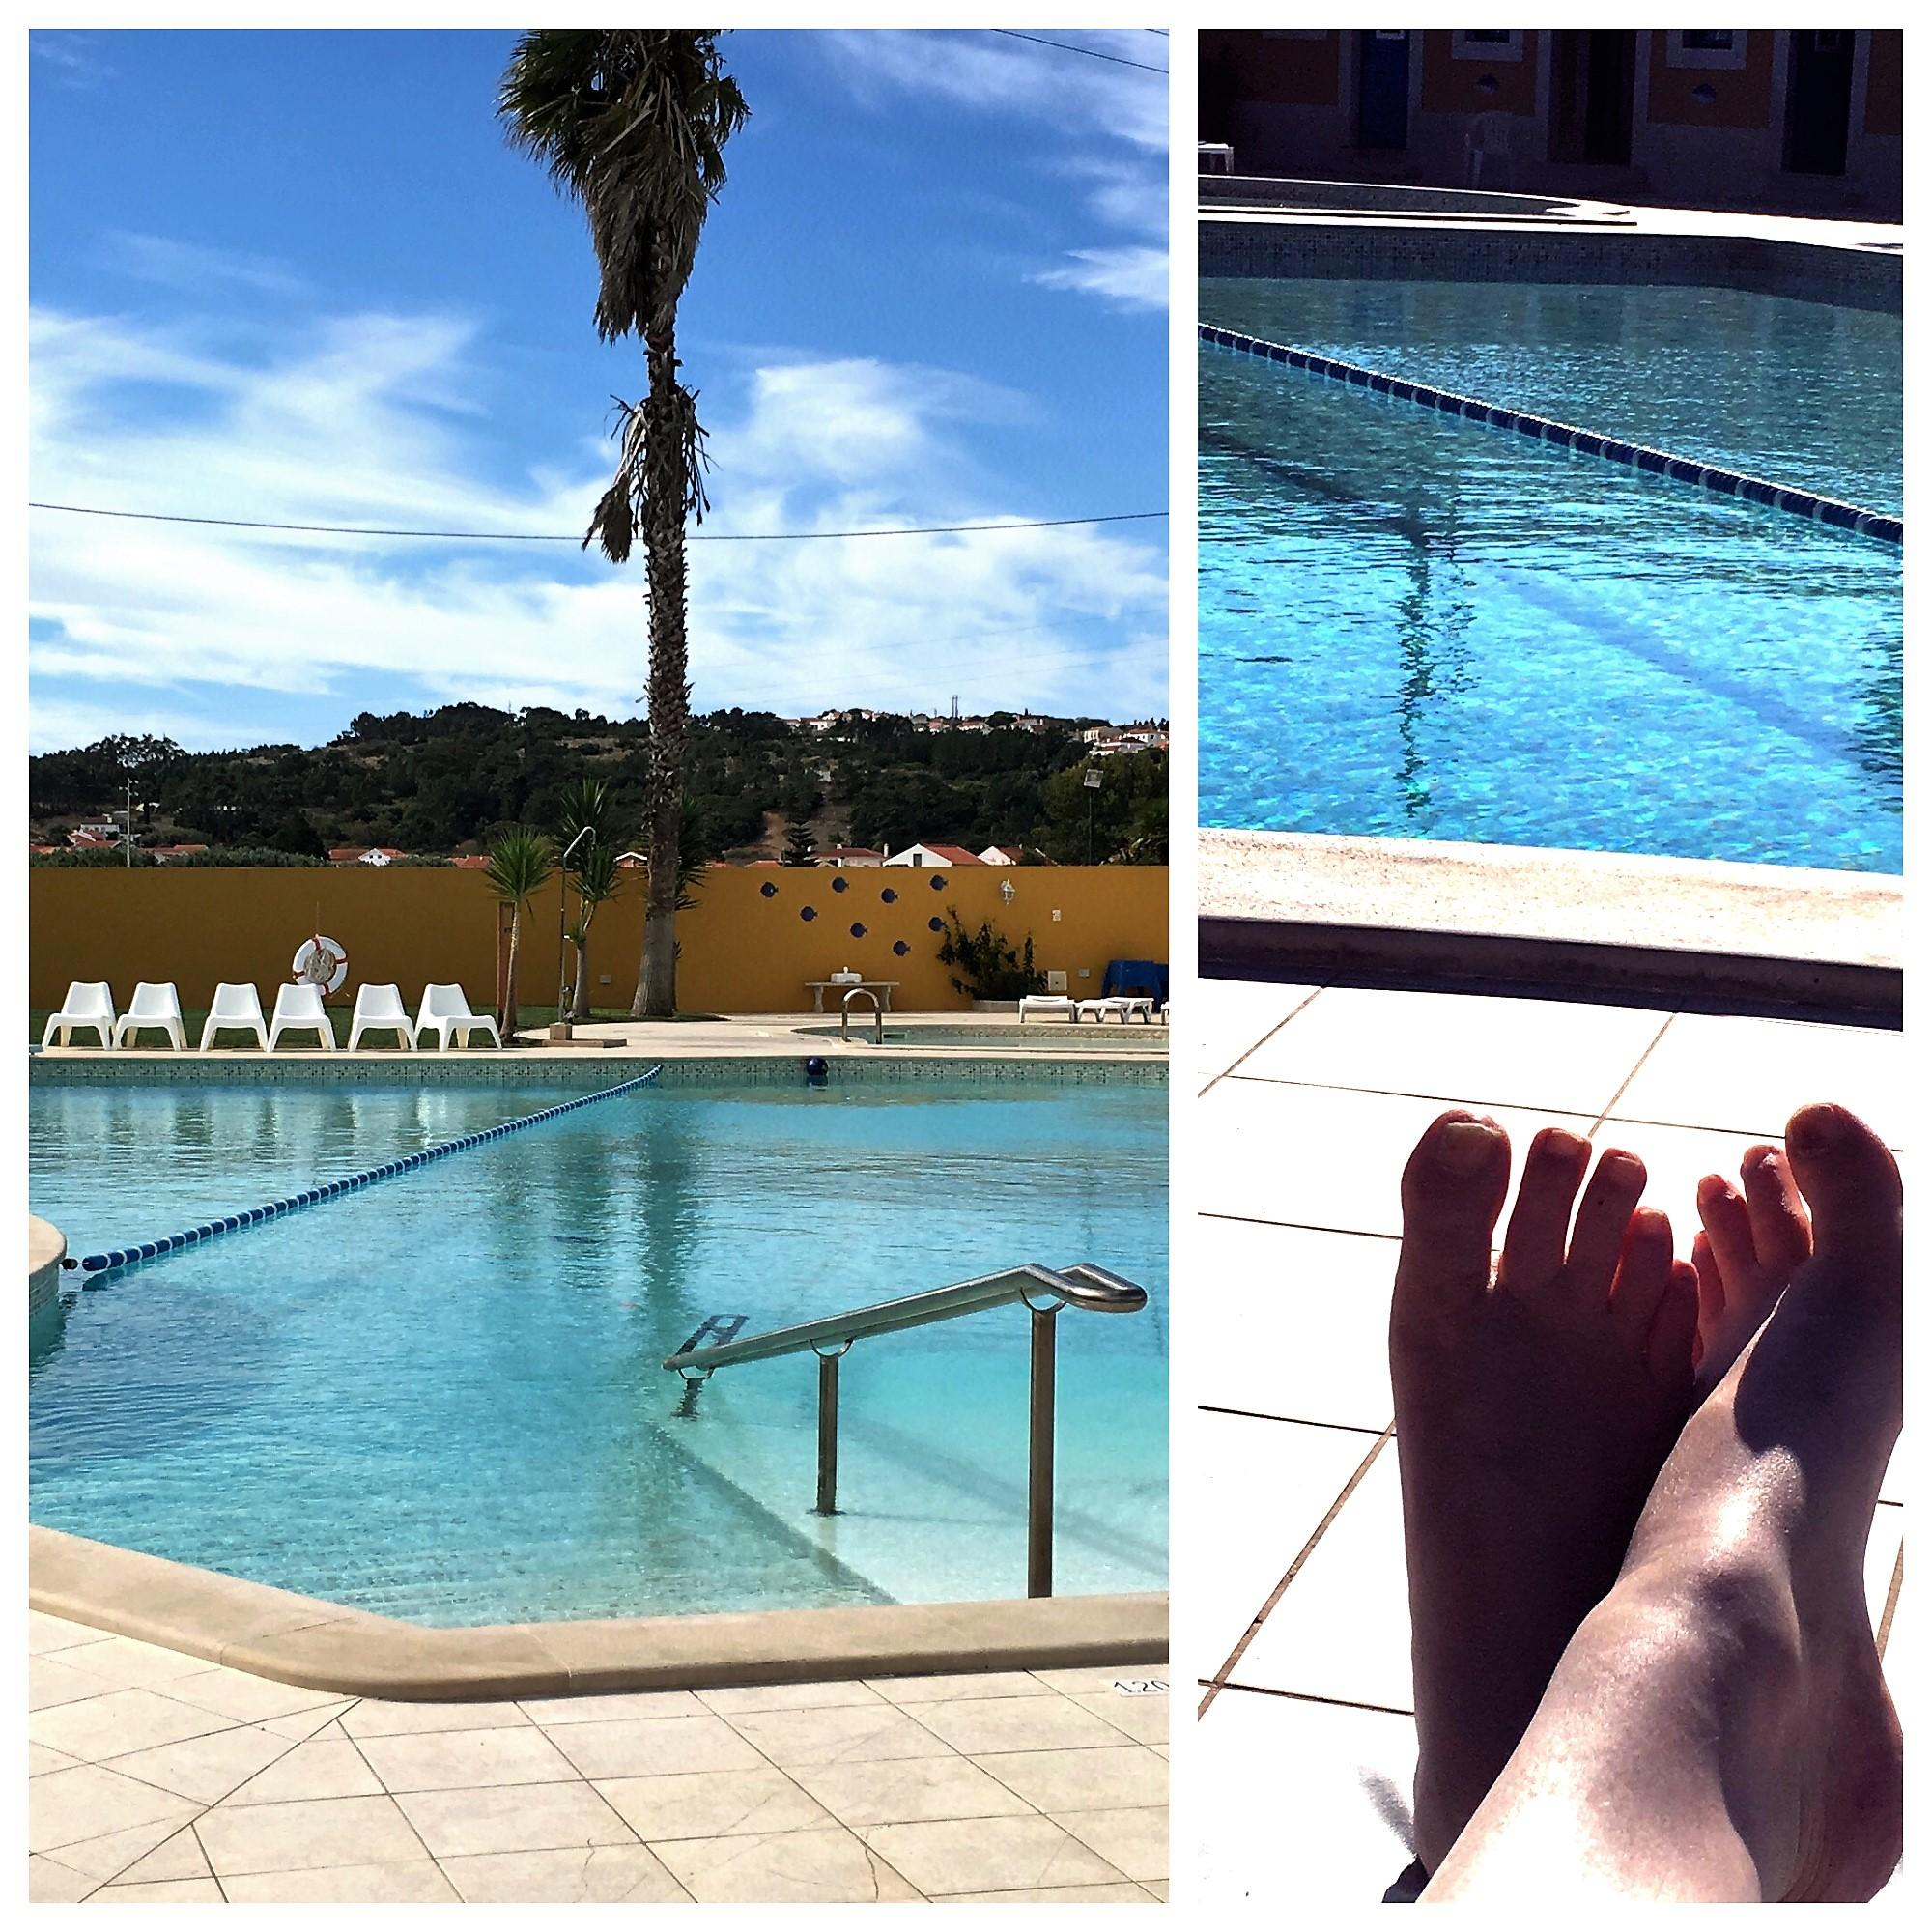 Oergevoel-Olho-Morino-Mansion-Pool